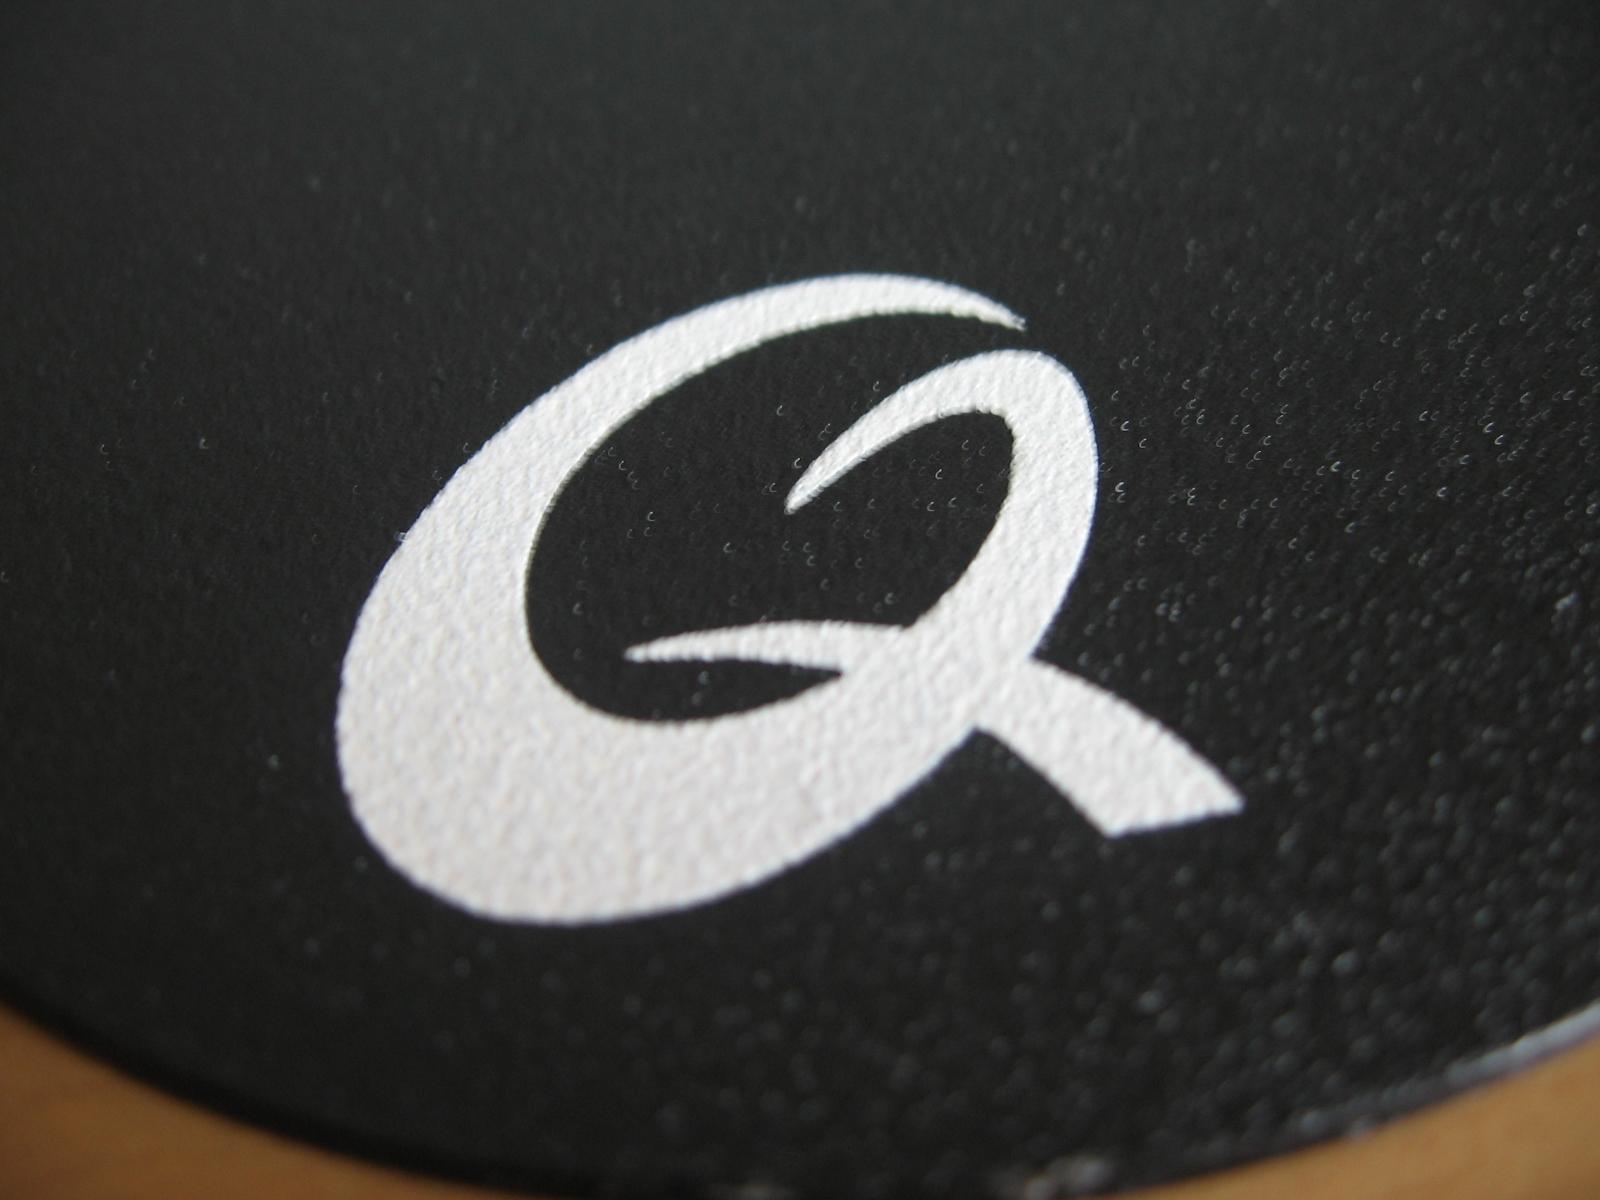 http://phothorizons.free.fr/Q-Pad%20031.jpg